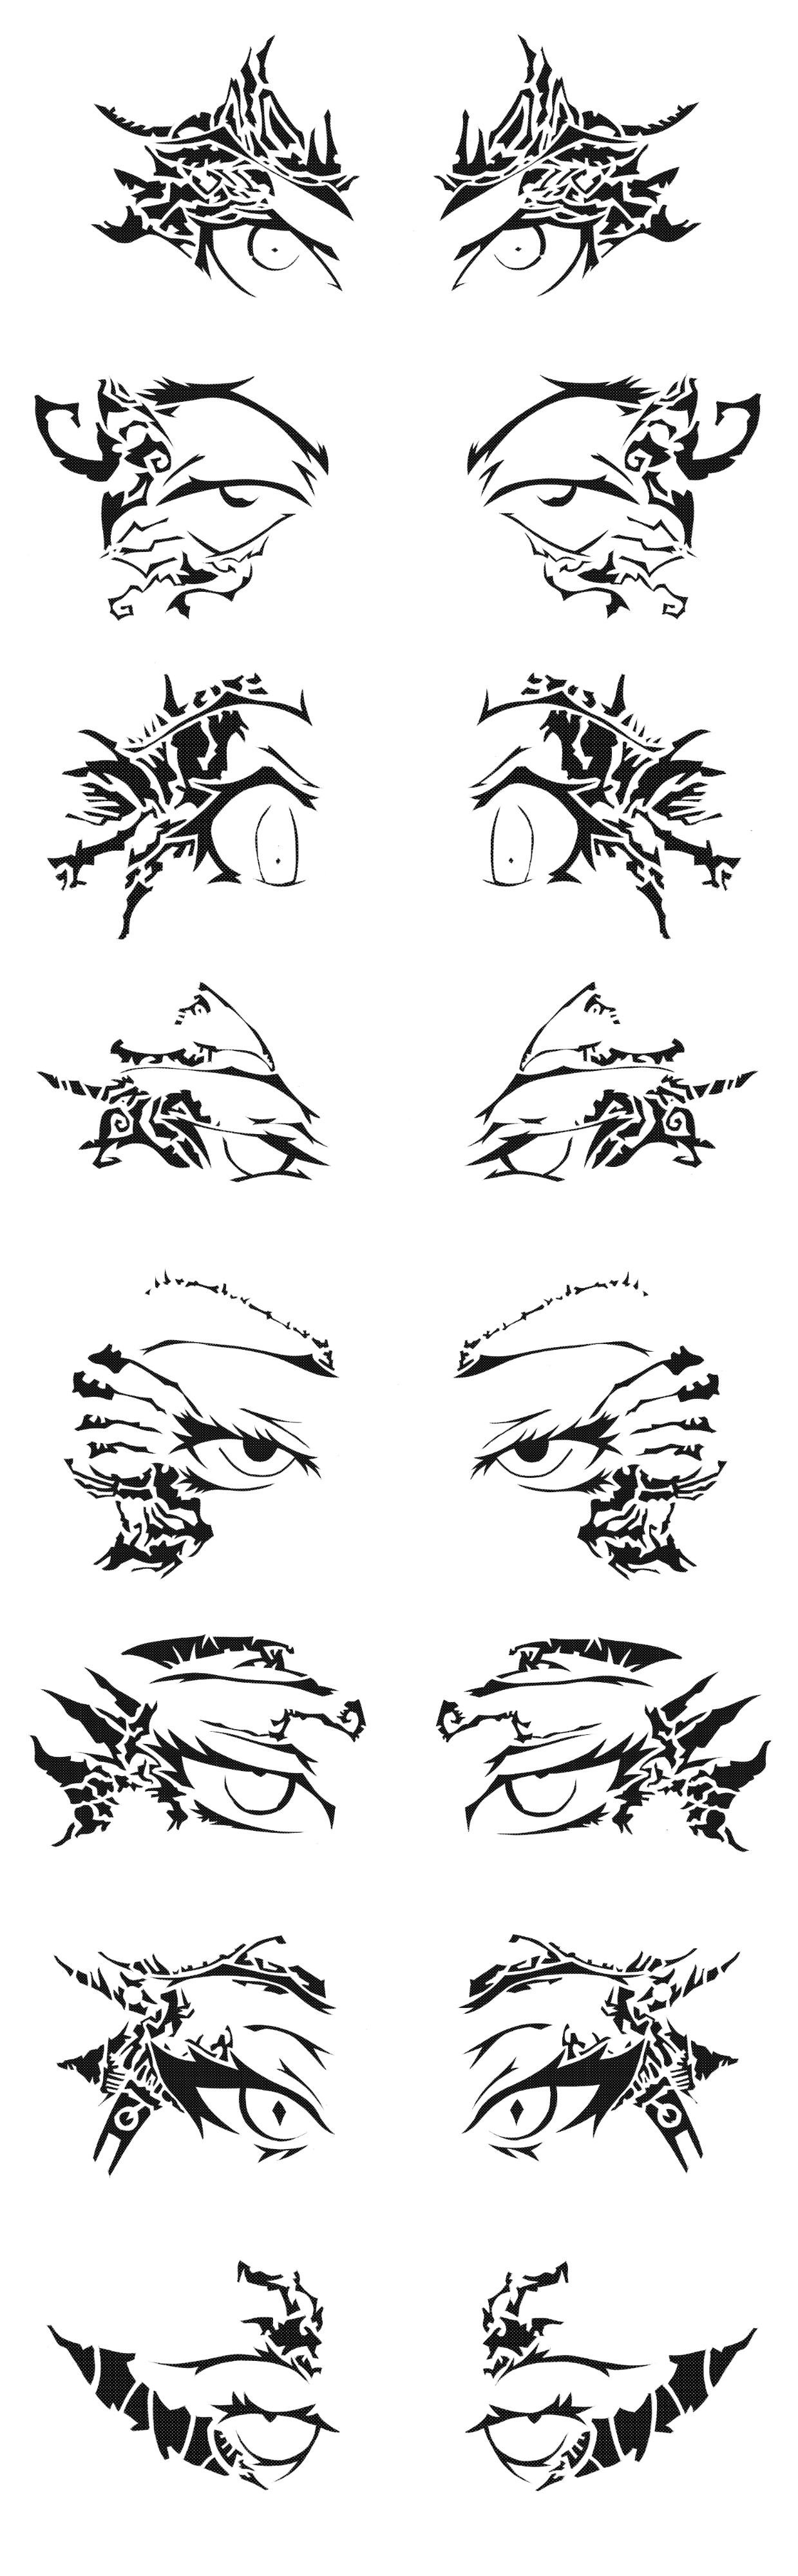 Bitchin' Eyes by GAGBAGCHEN